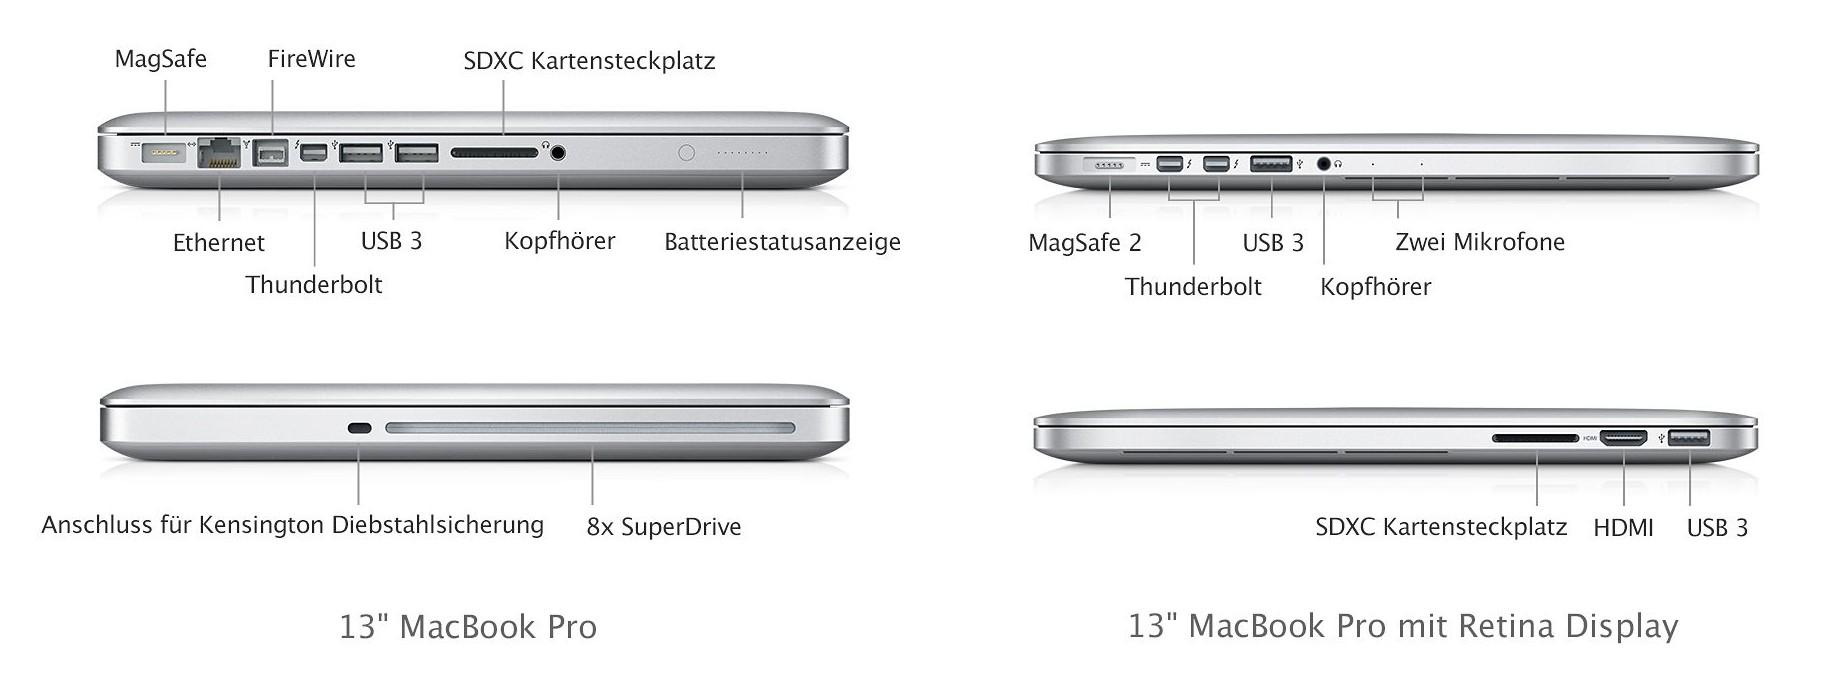 Apple macbook pro retina 13 vs mac 13